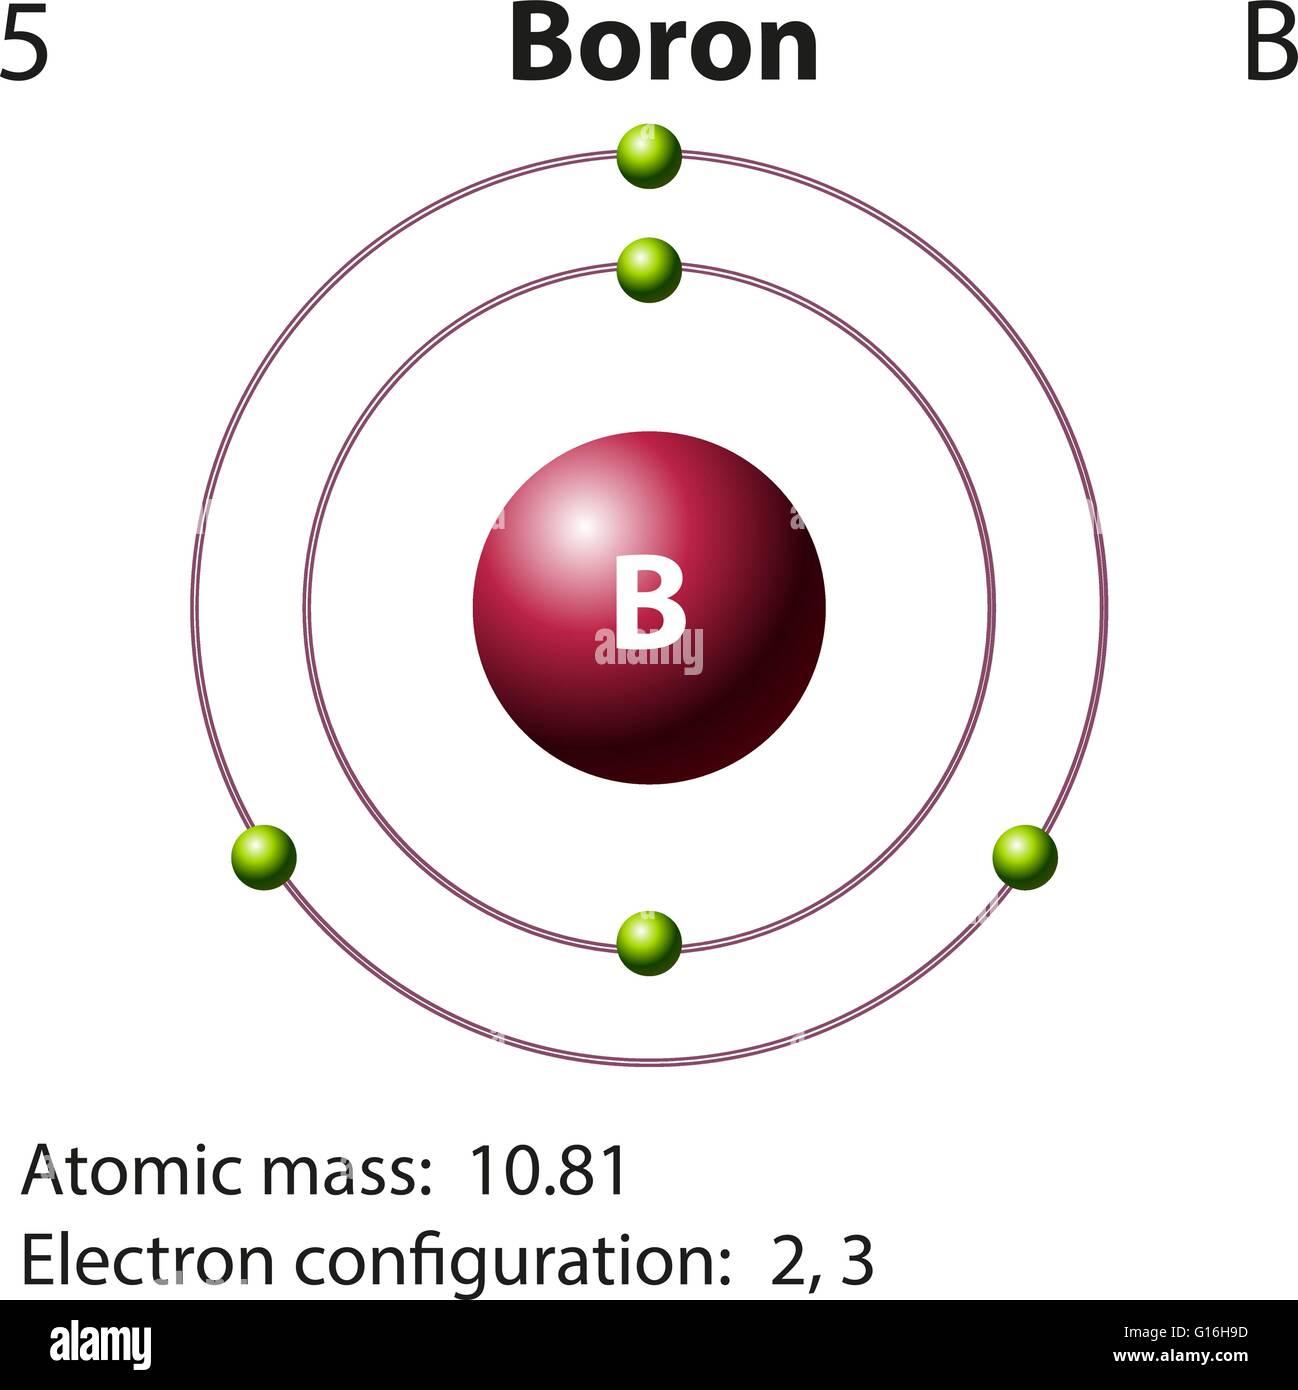 diagram representation of the element boron illustration